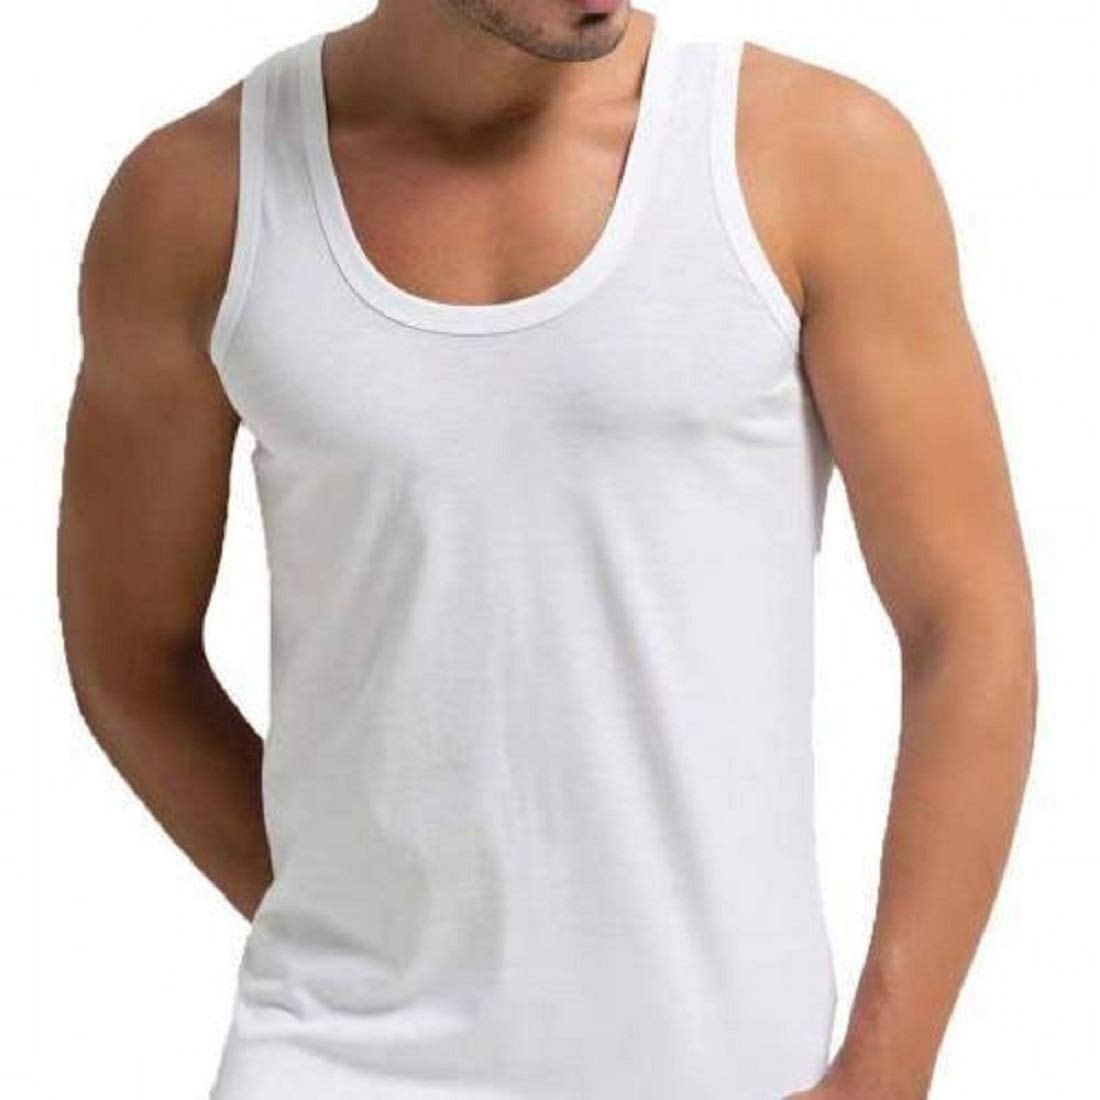 f8649be79e1 Beylem Mens Vest 100% Cotton Singlet Vests Underwear Pack of 3 Mens Vest